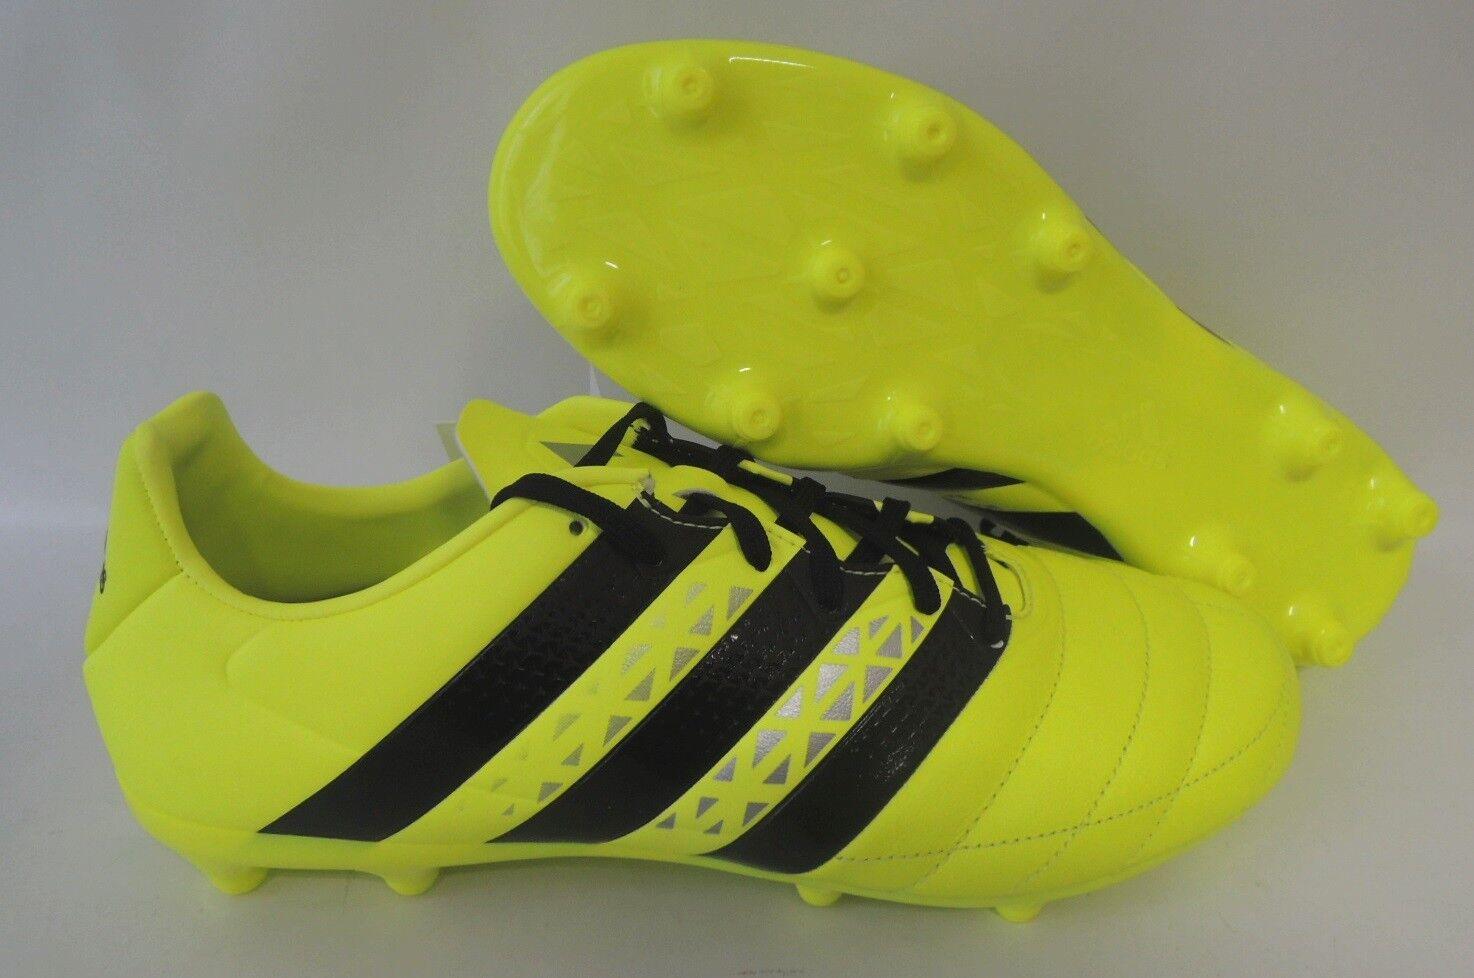 NEU Fußballschuhe adidas ACE 16.3 FG Leather Größe 41 1 3 Fußballschuhe AQ4456  | Lebensecht